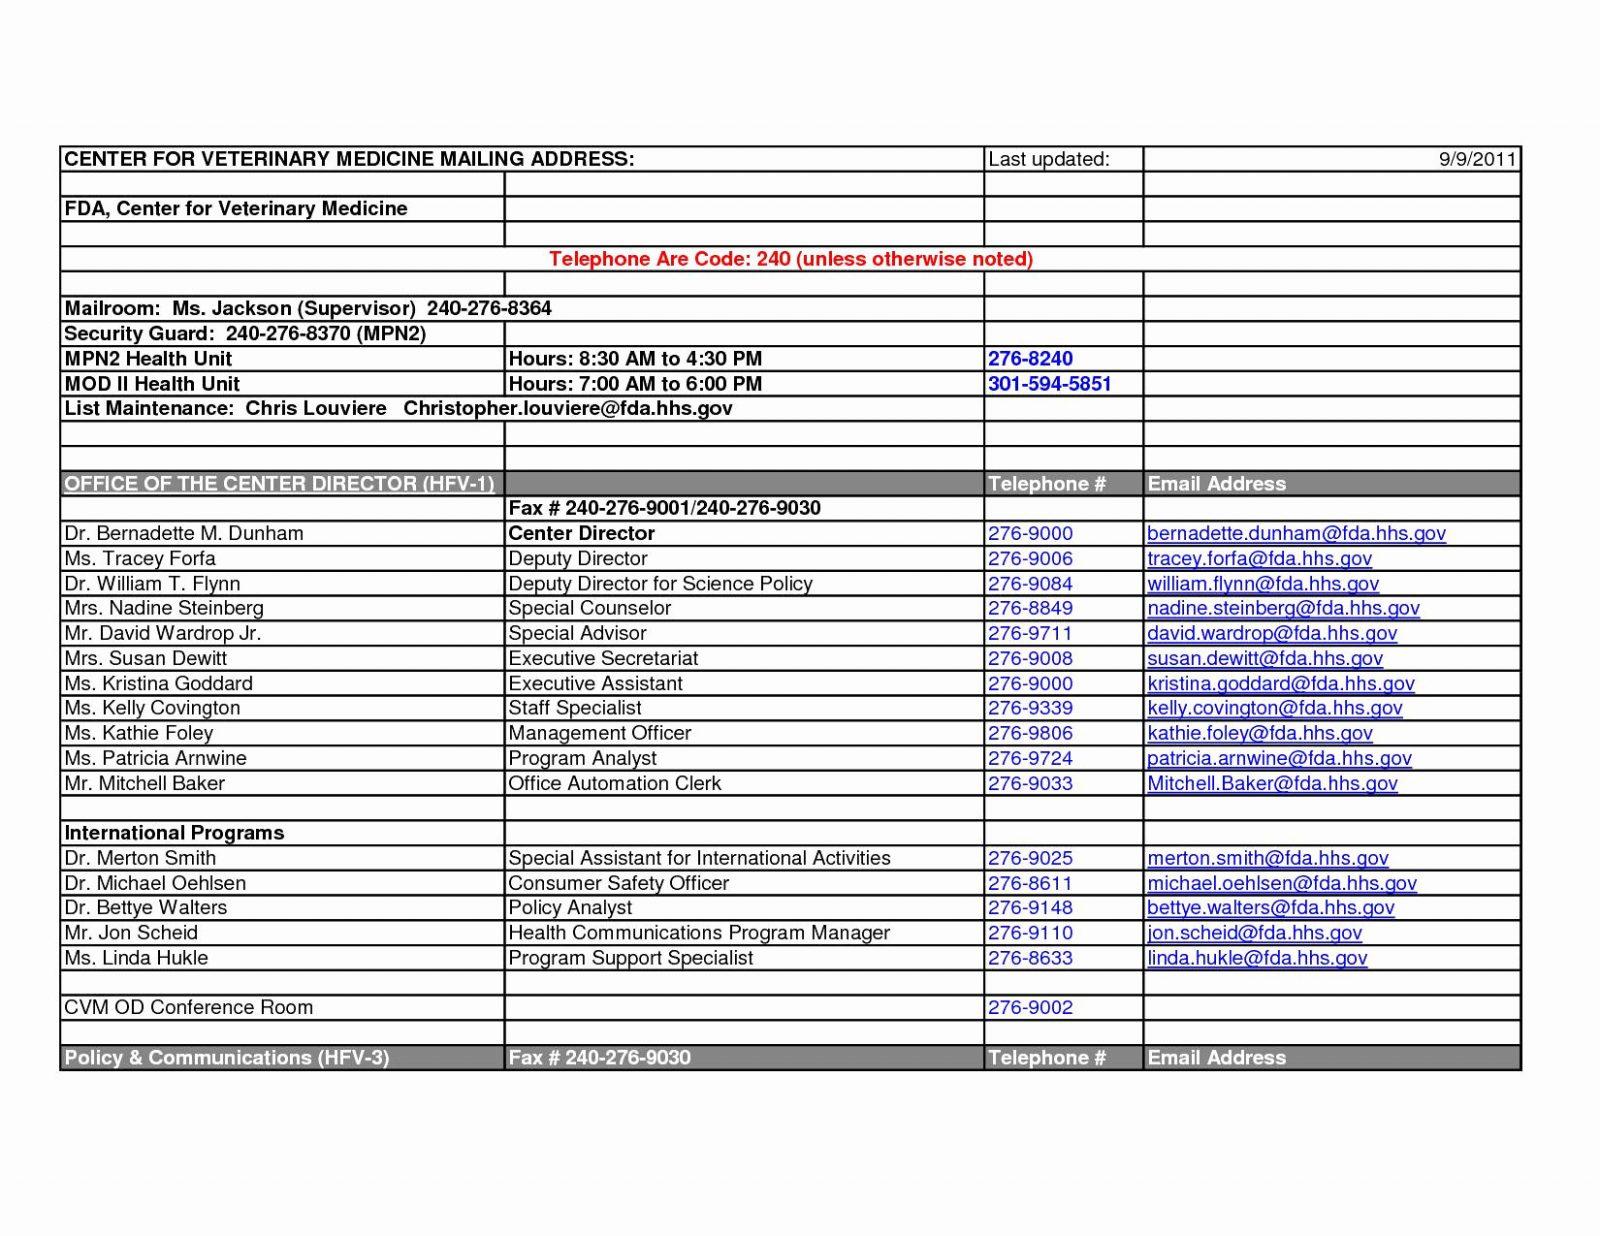 Sample Wedding Guest List Spreadsheet Inside Sample Wedding Guest List Spreadsheet Example Awesome  Emergentreport